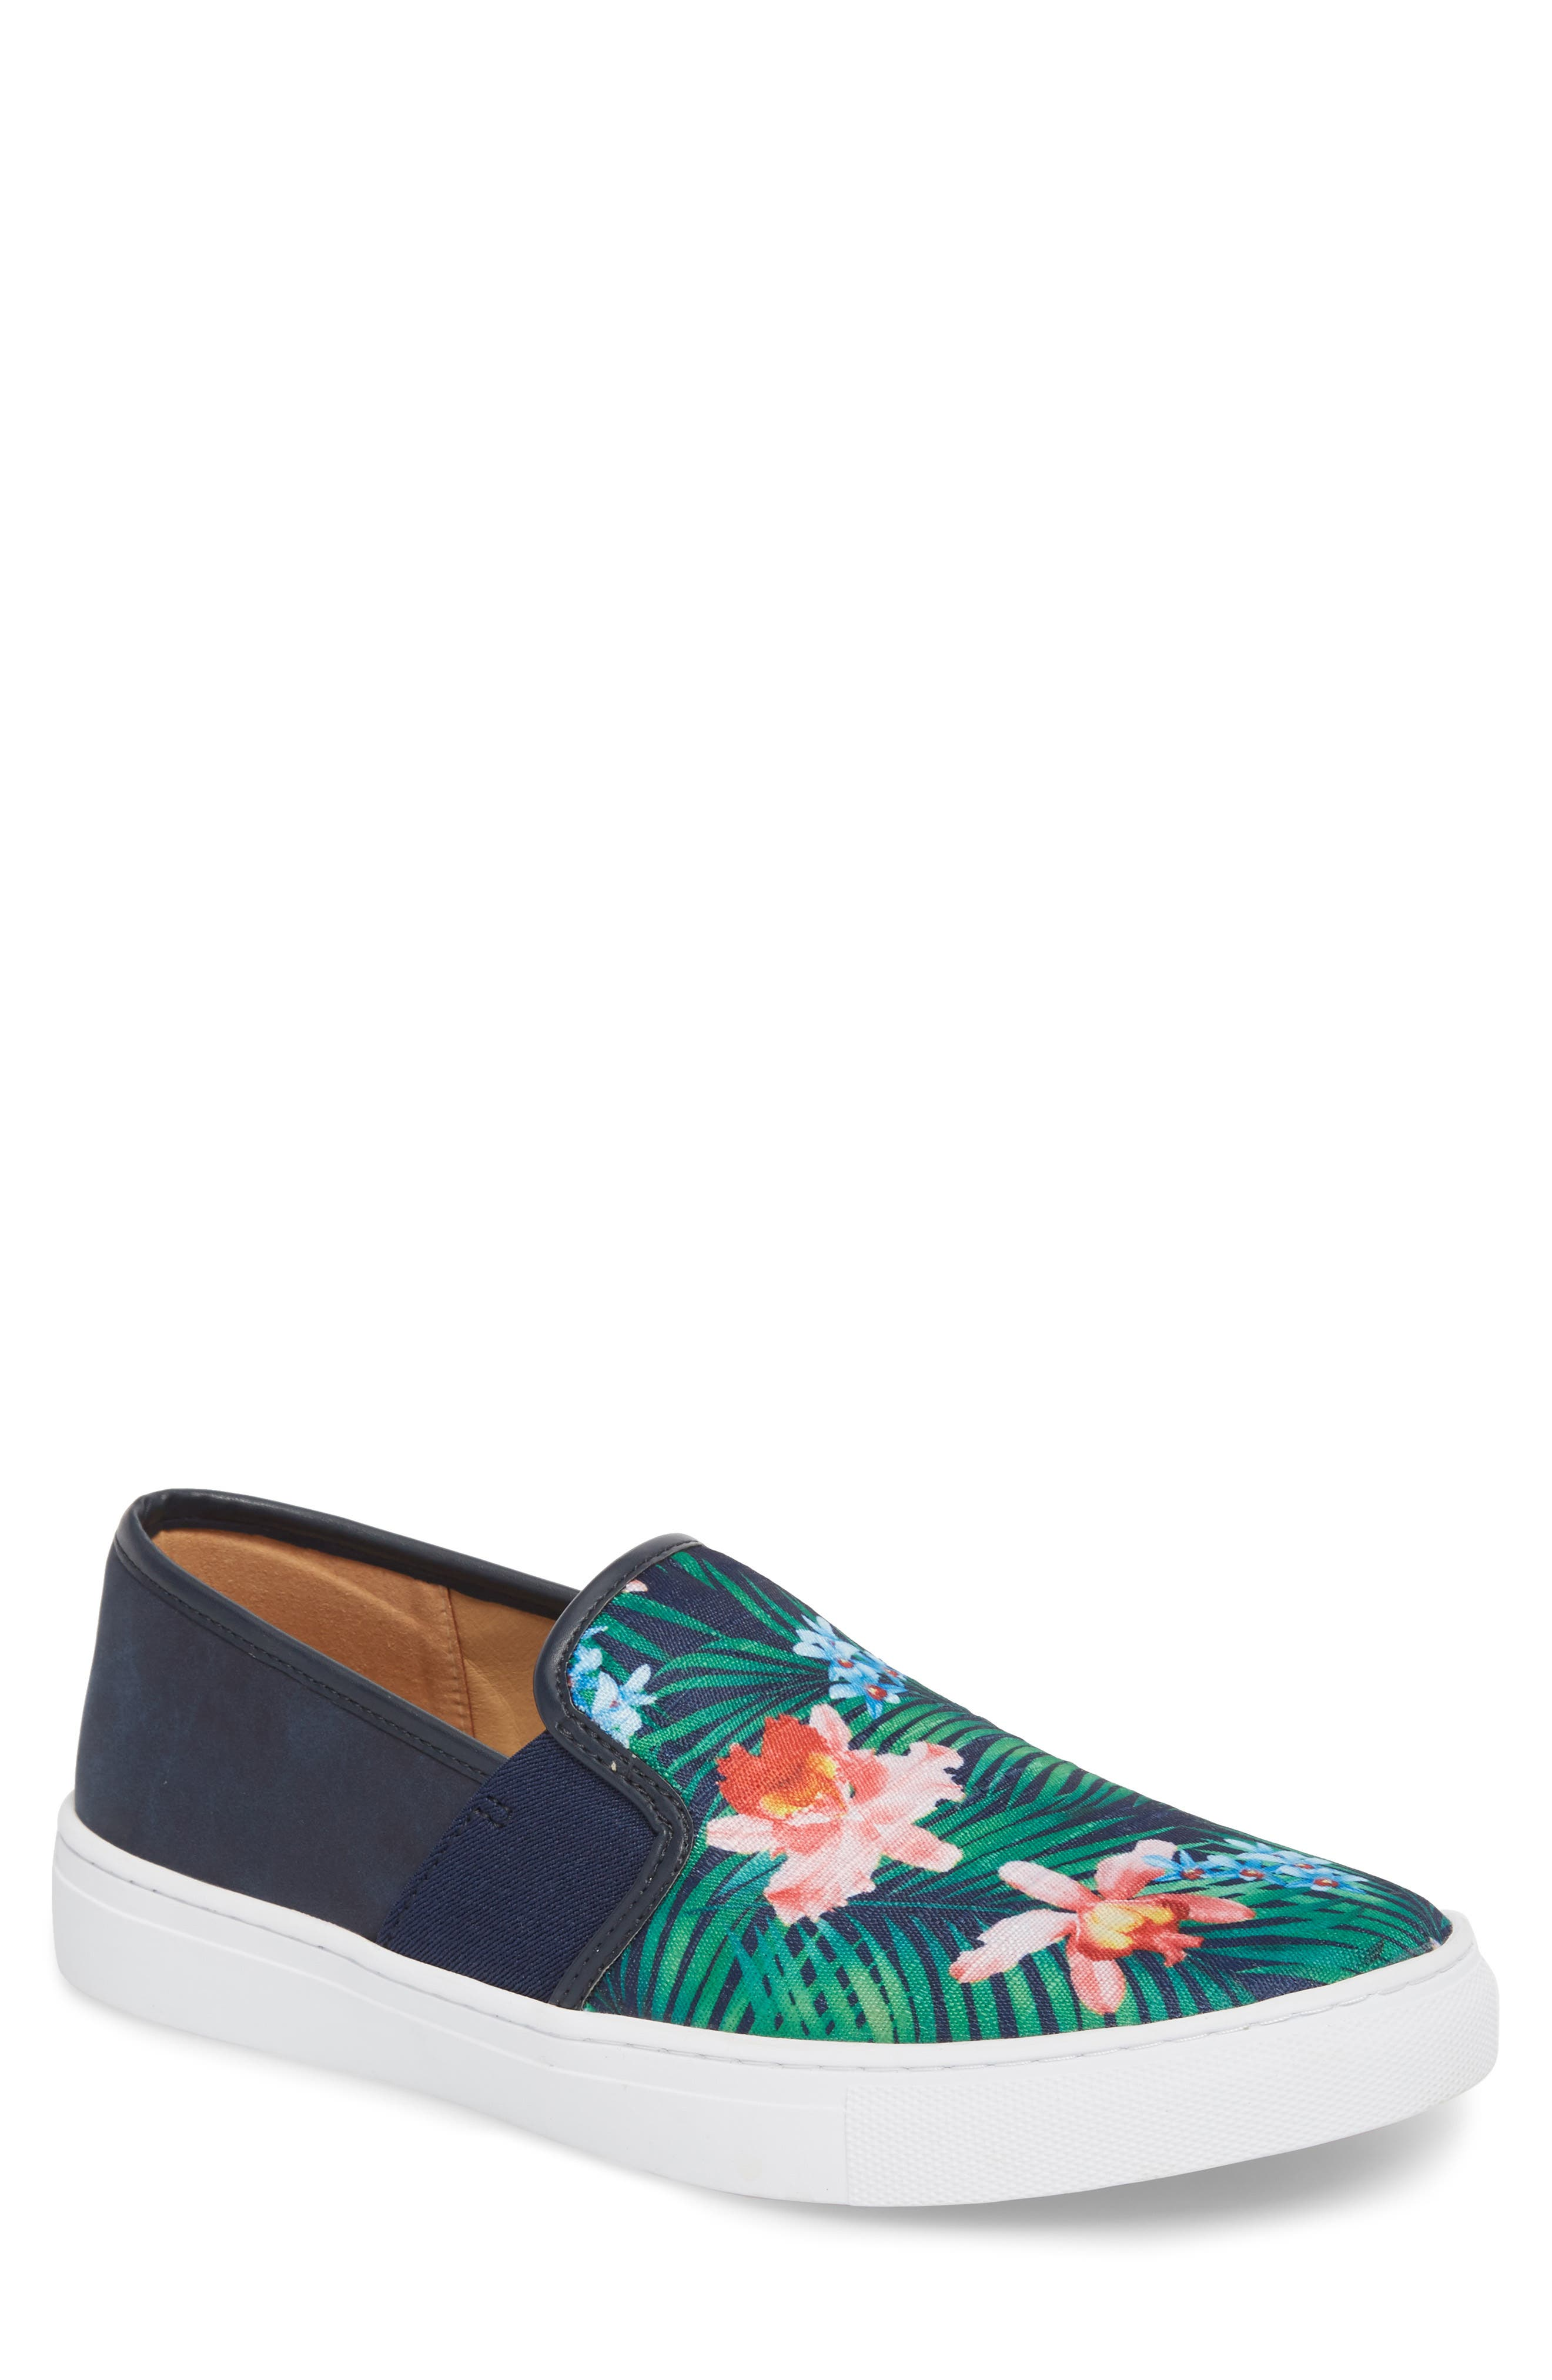 Fish 'N' Chips Bali Slip-On Sneaker,                         Main,                         color, Navy Multi Fabric